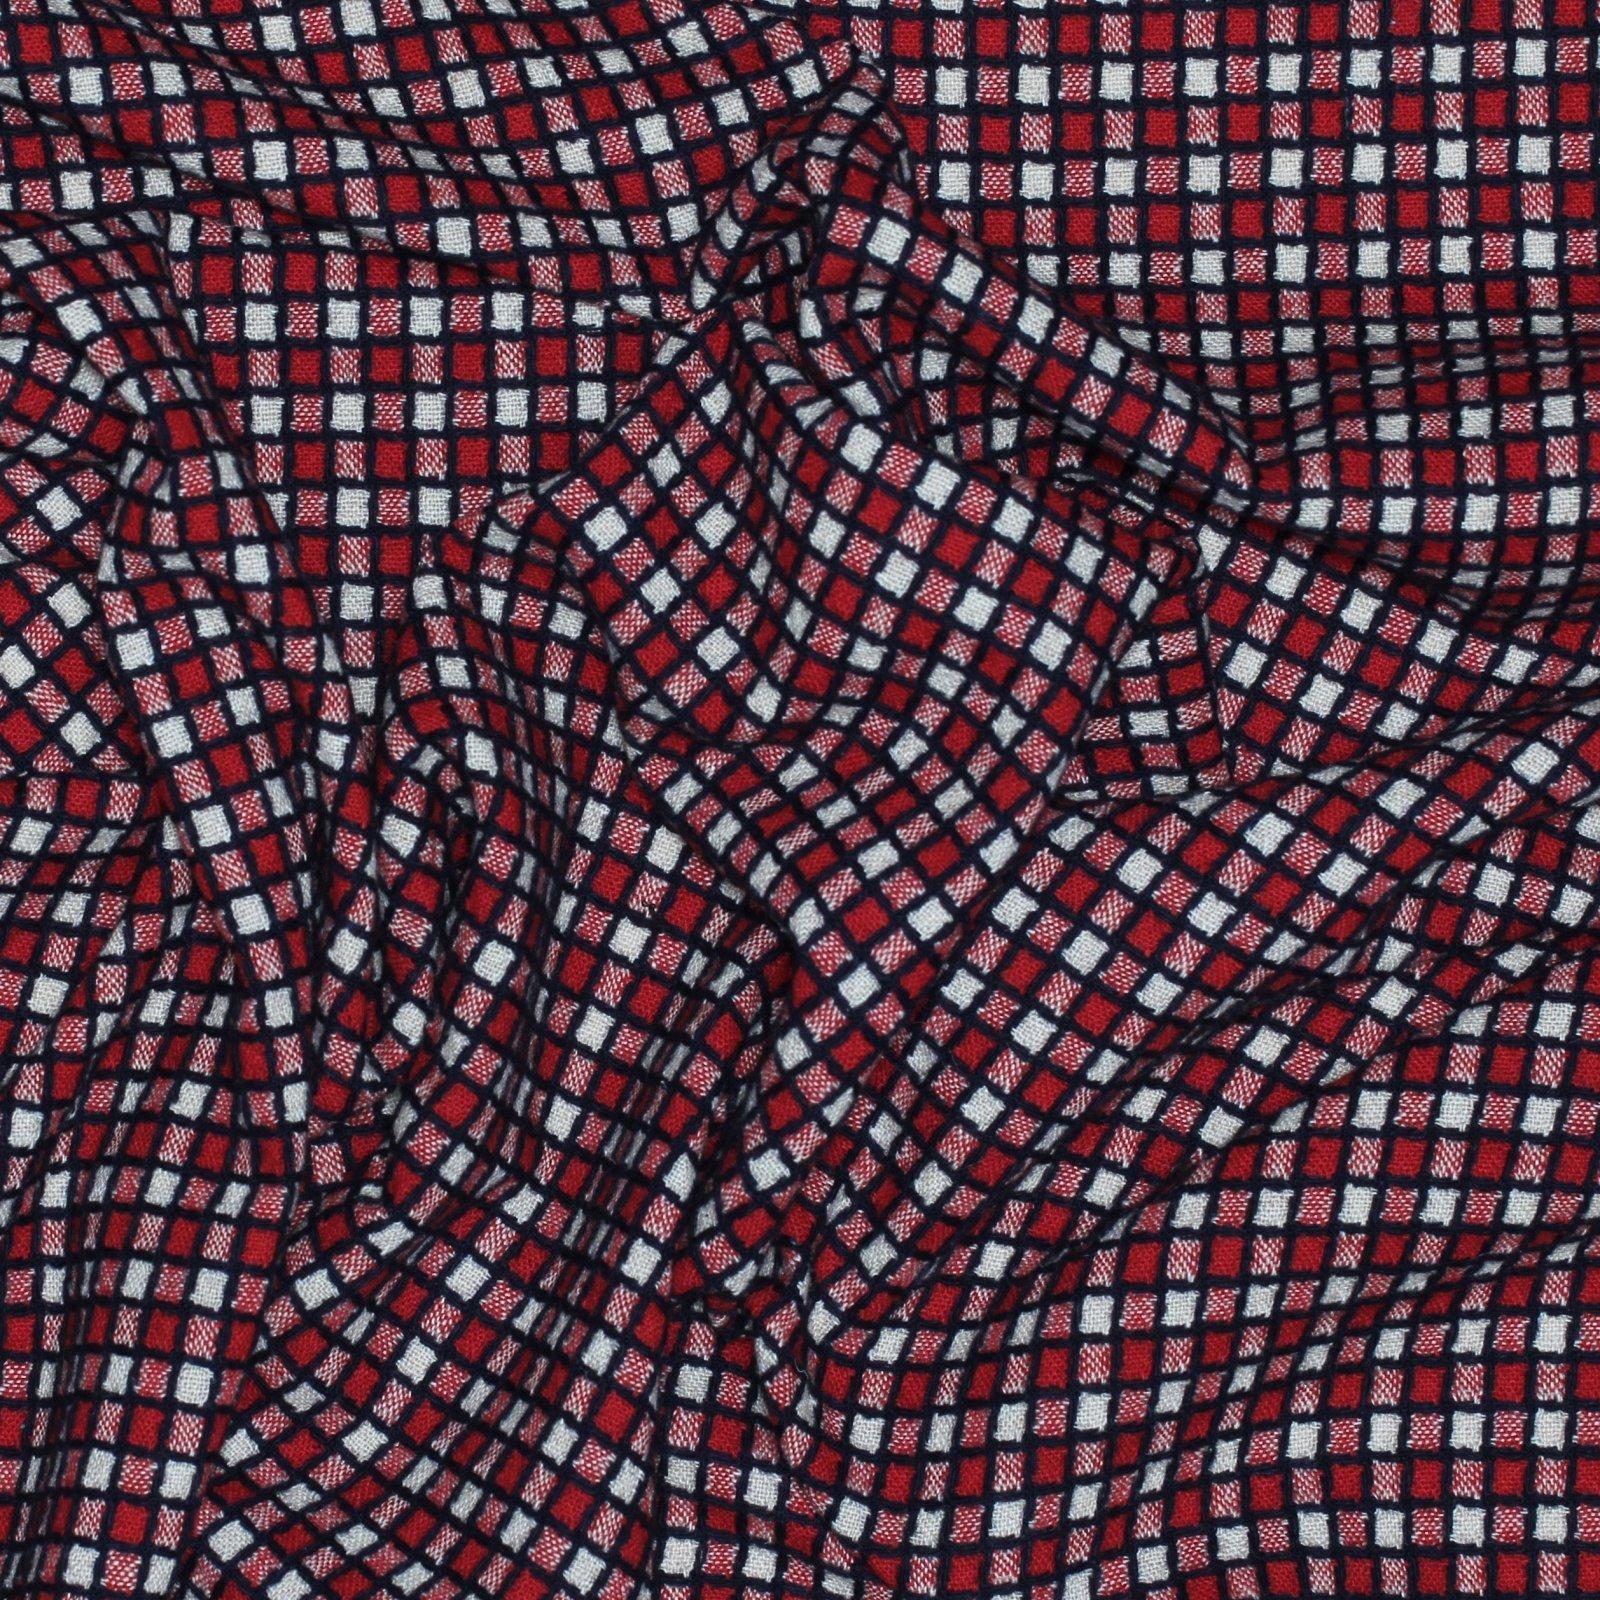 Hokkoh Japanese Wool Tweed Red/Navy/White Check